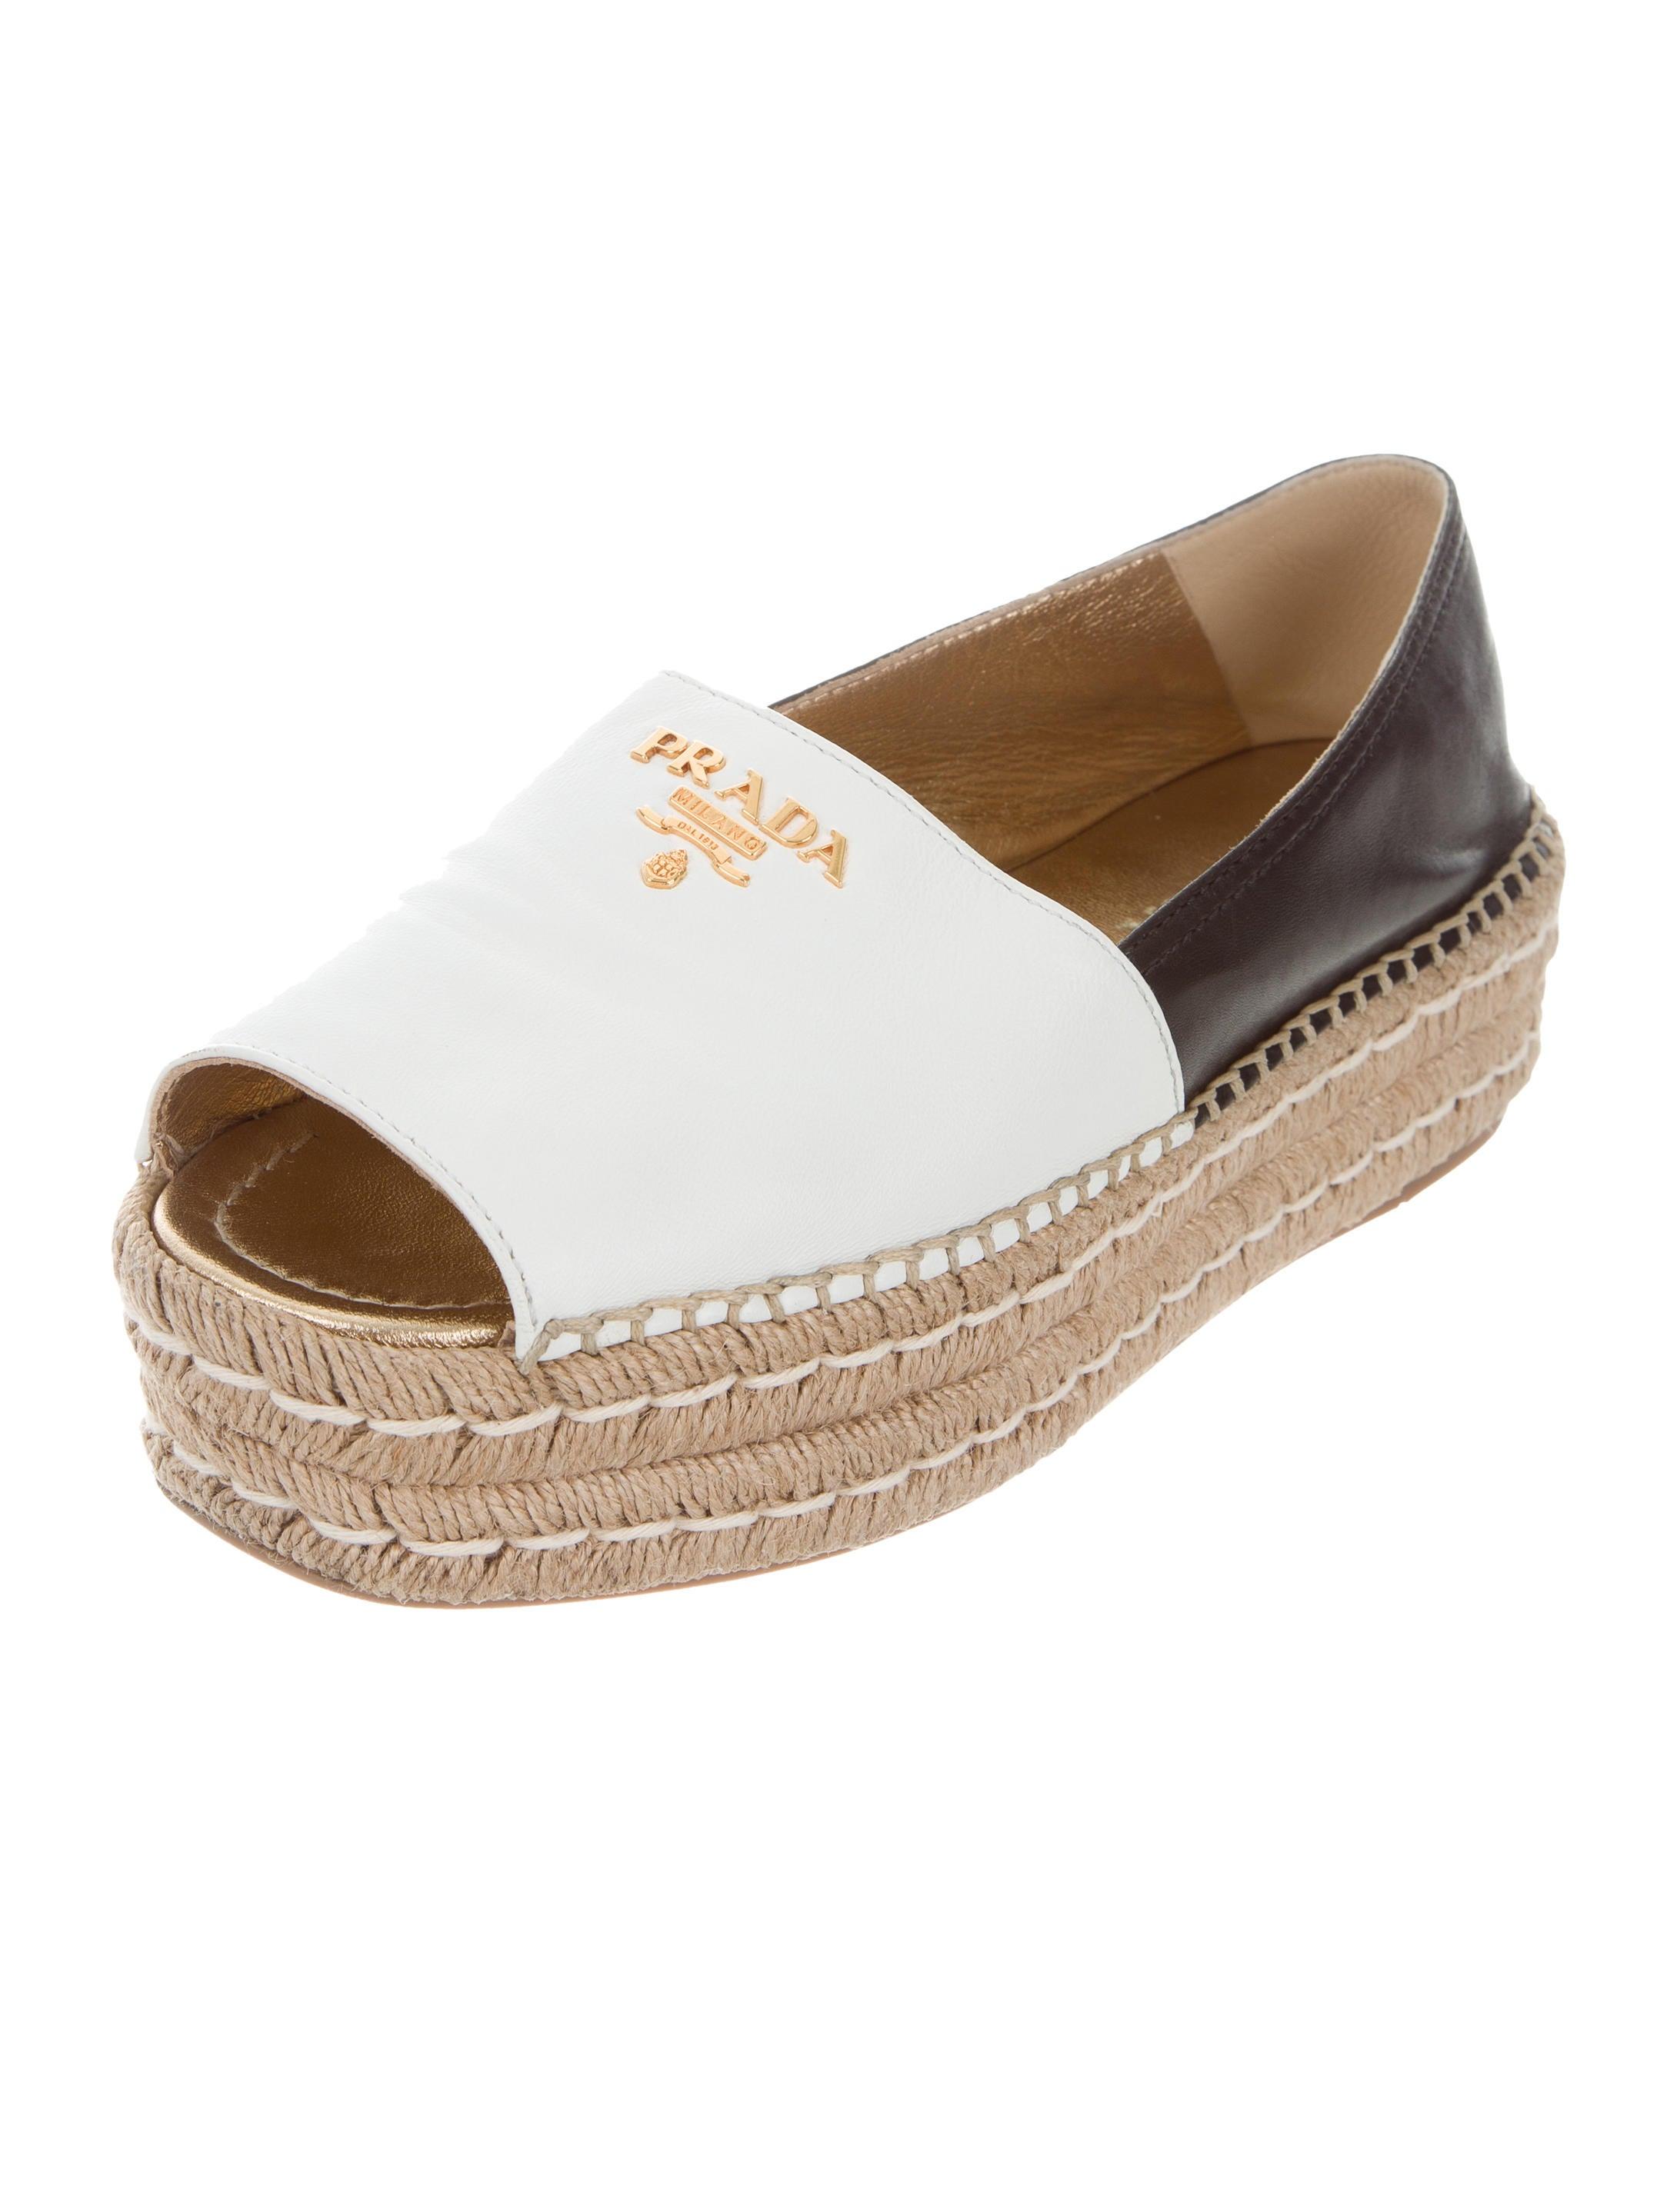 White Prada Shoes